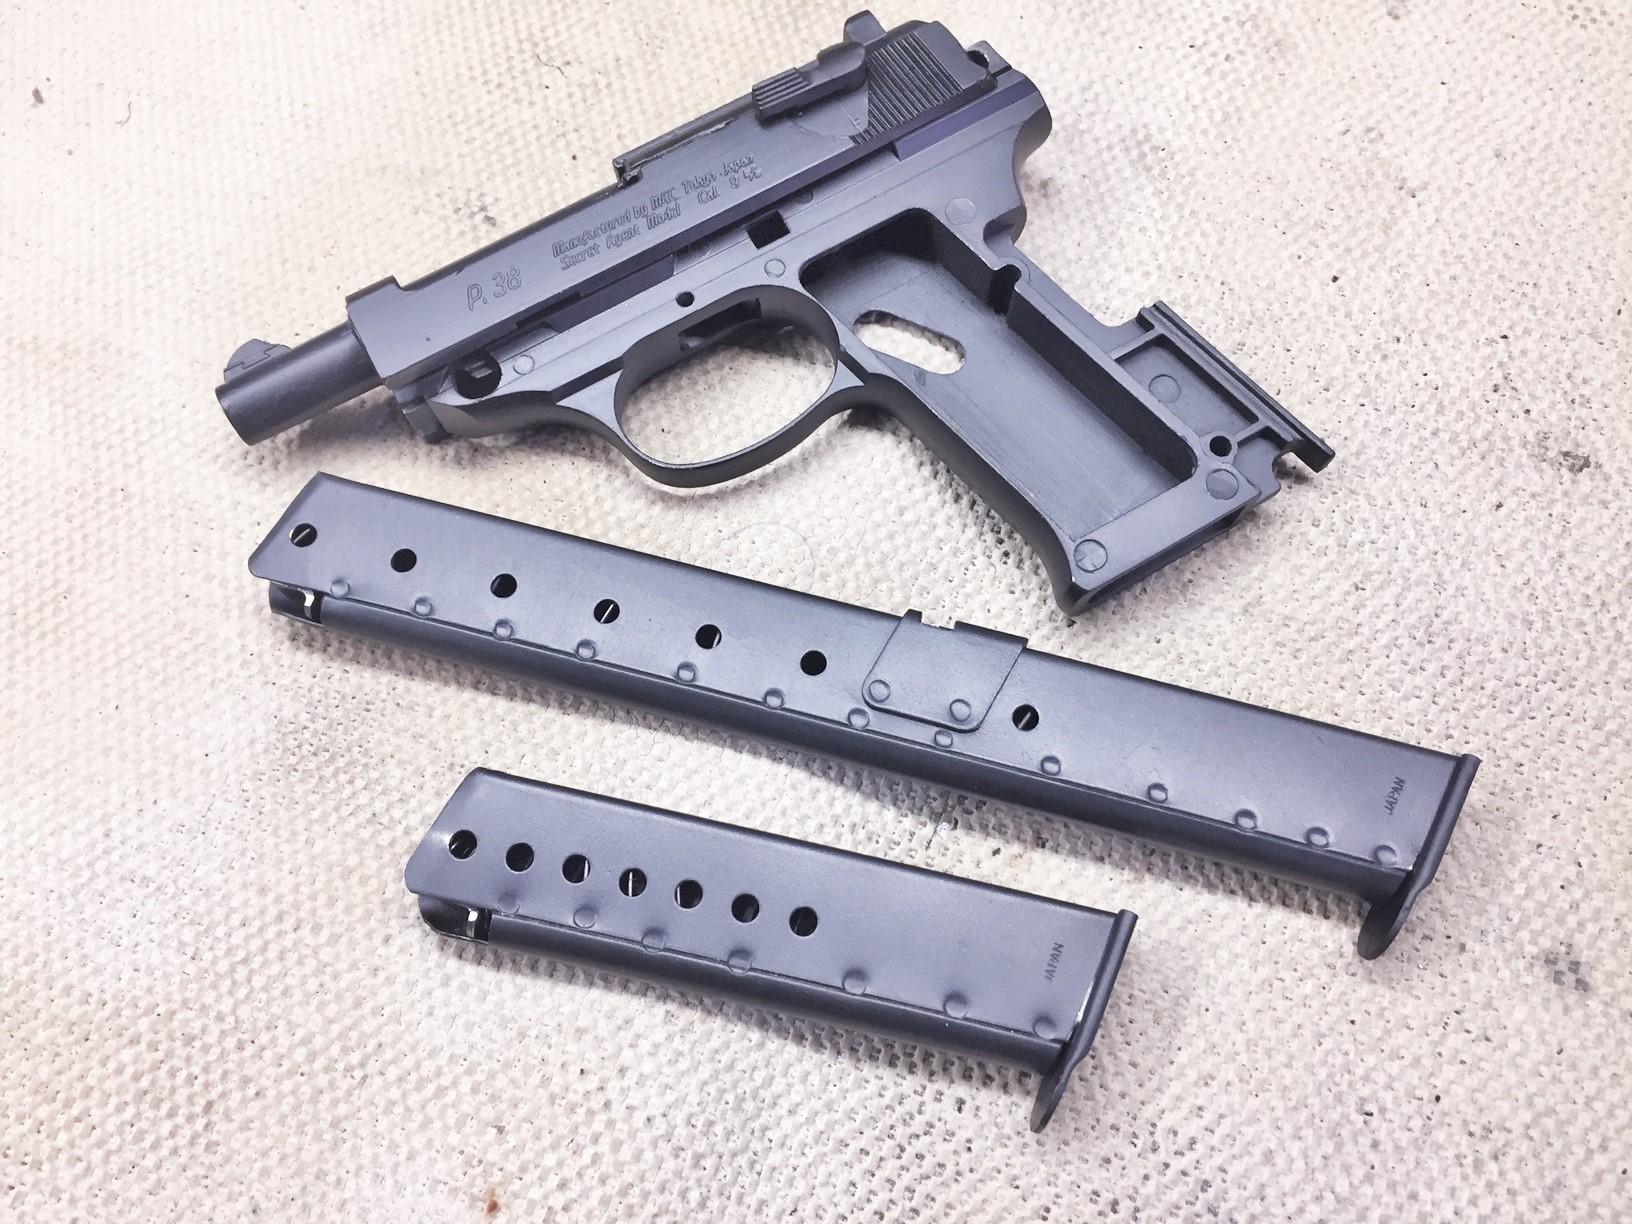 Walter's UNCLE Gun (30).jpg